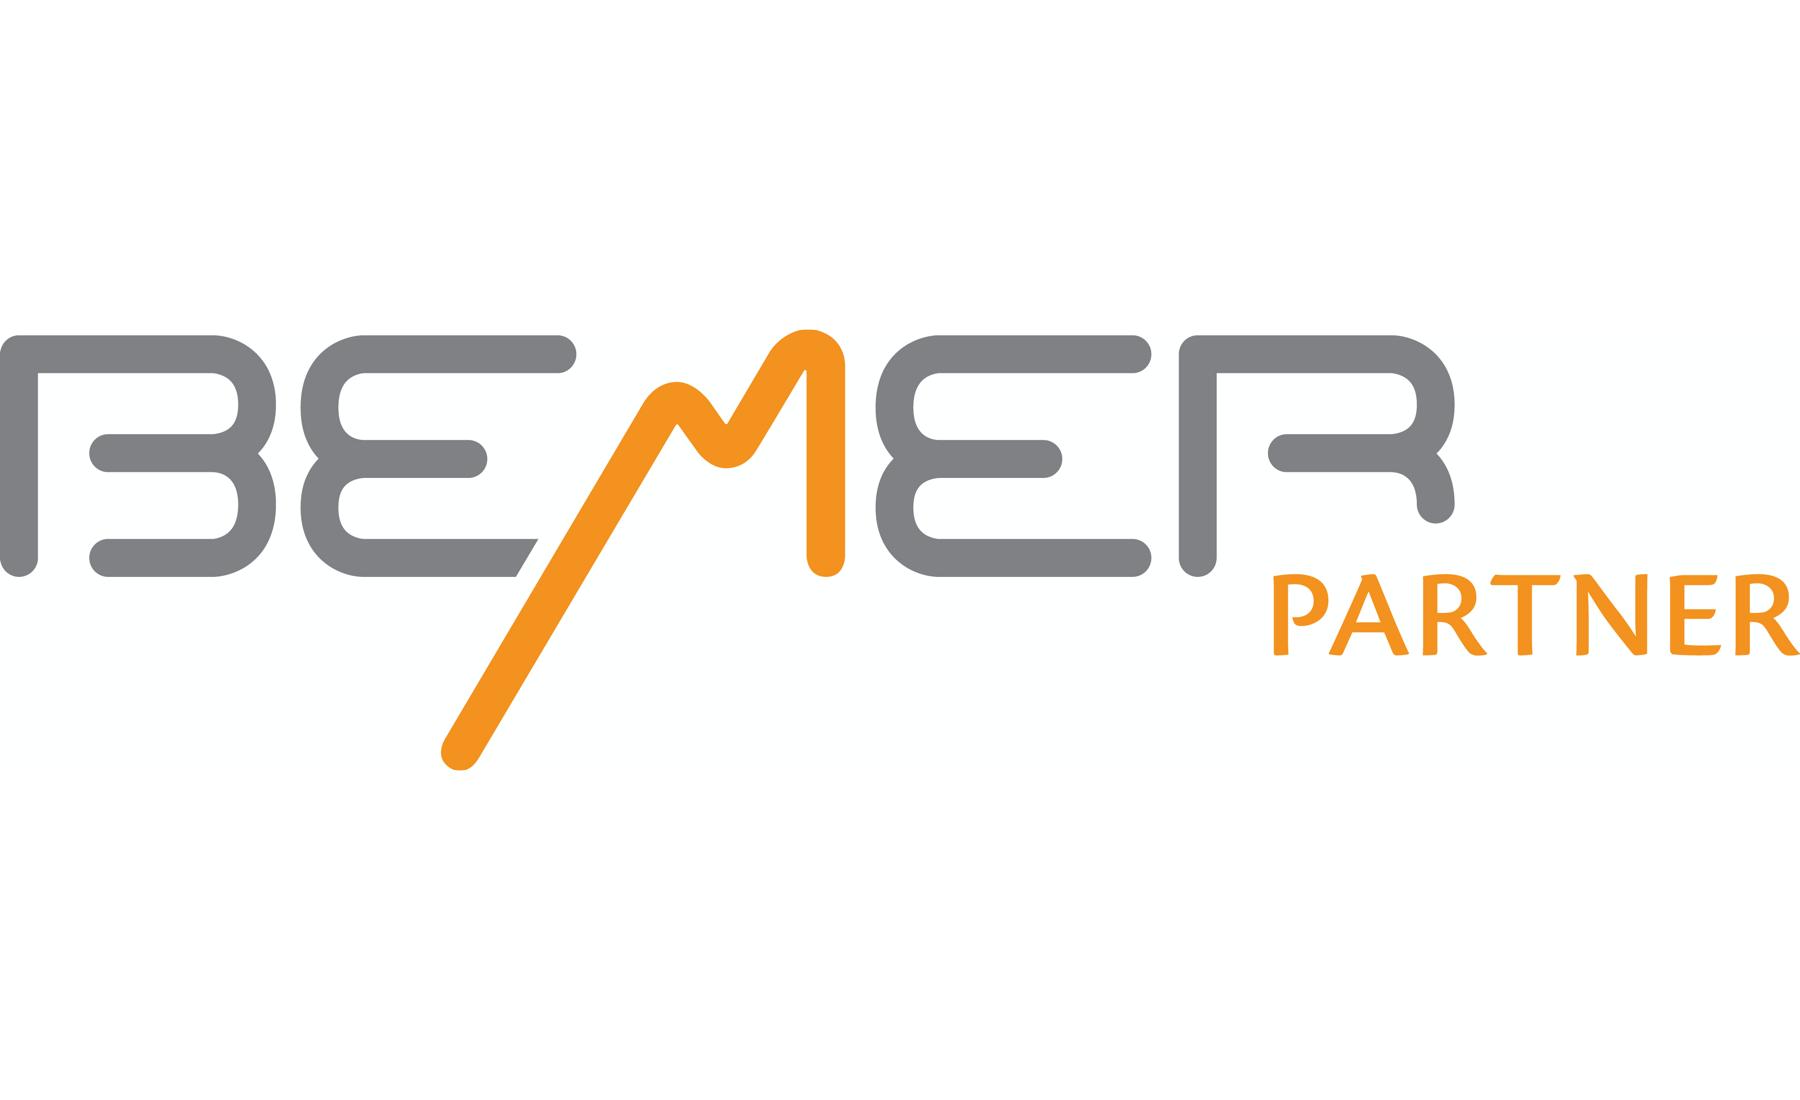 BEMER_Partner